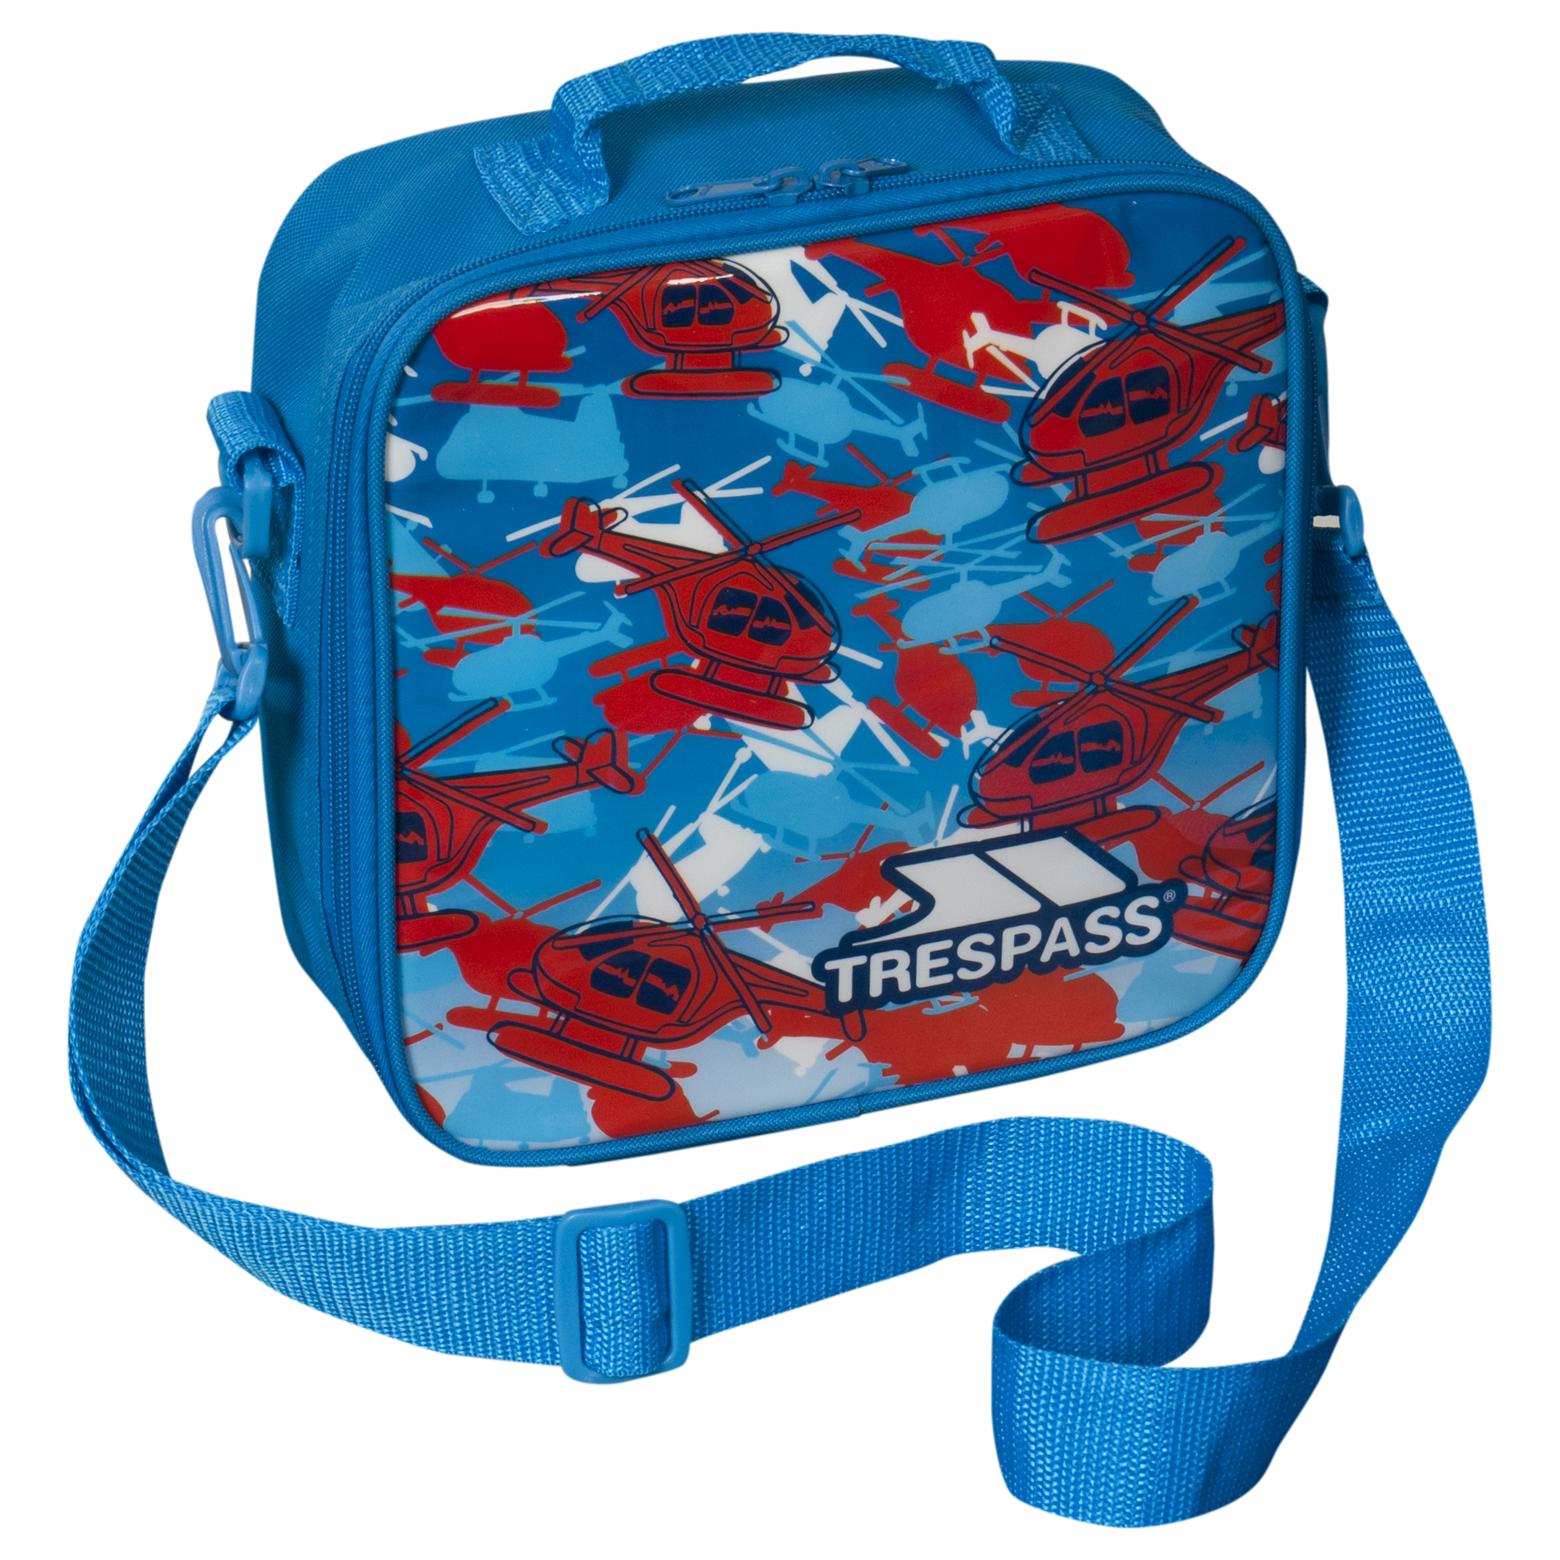 trespass playpiece boys lunch bag food picnic box ebay. Black Bedroom Furniture Sets. Home Design Ideas